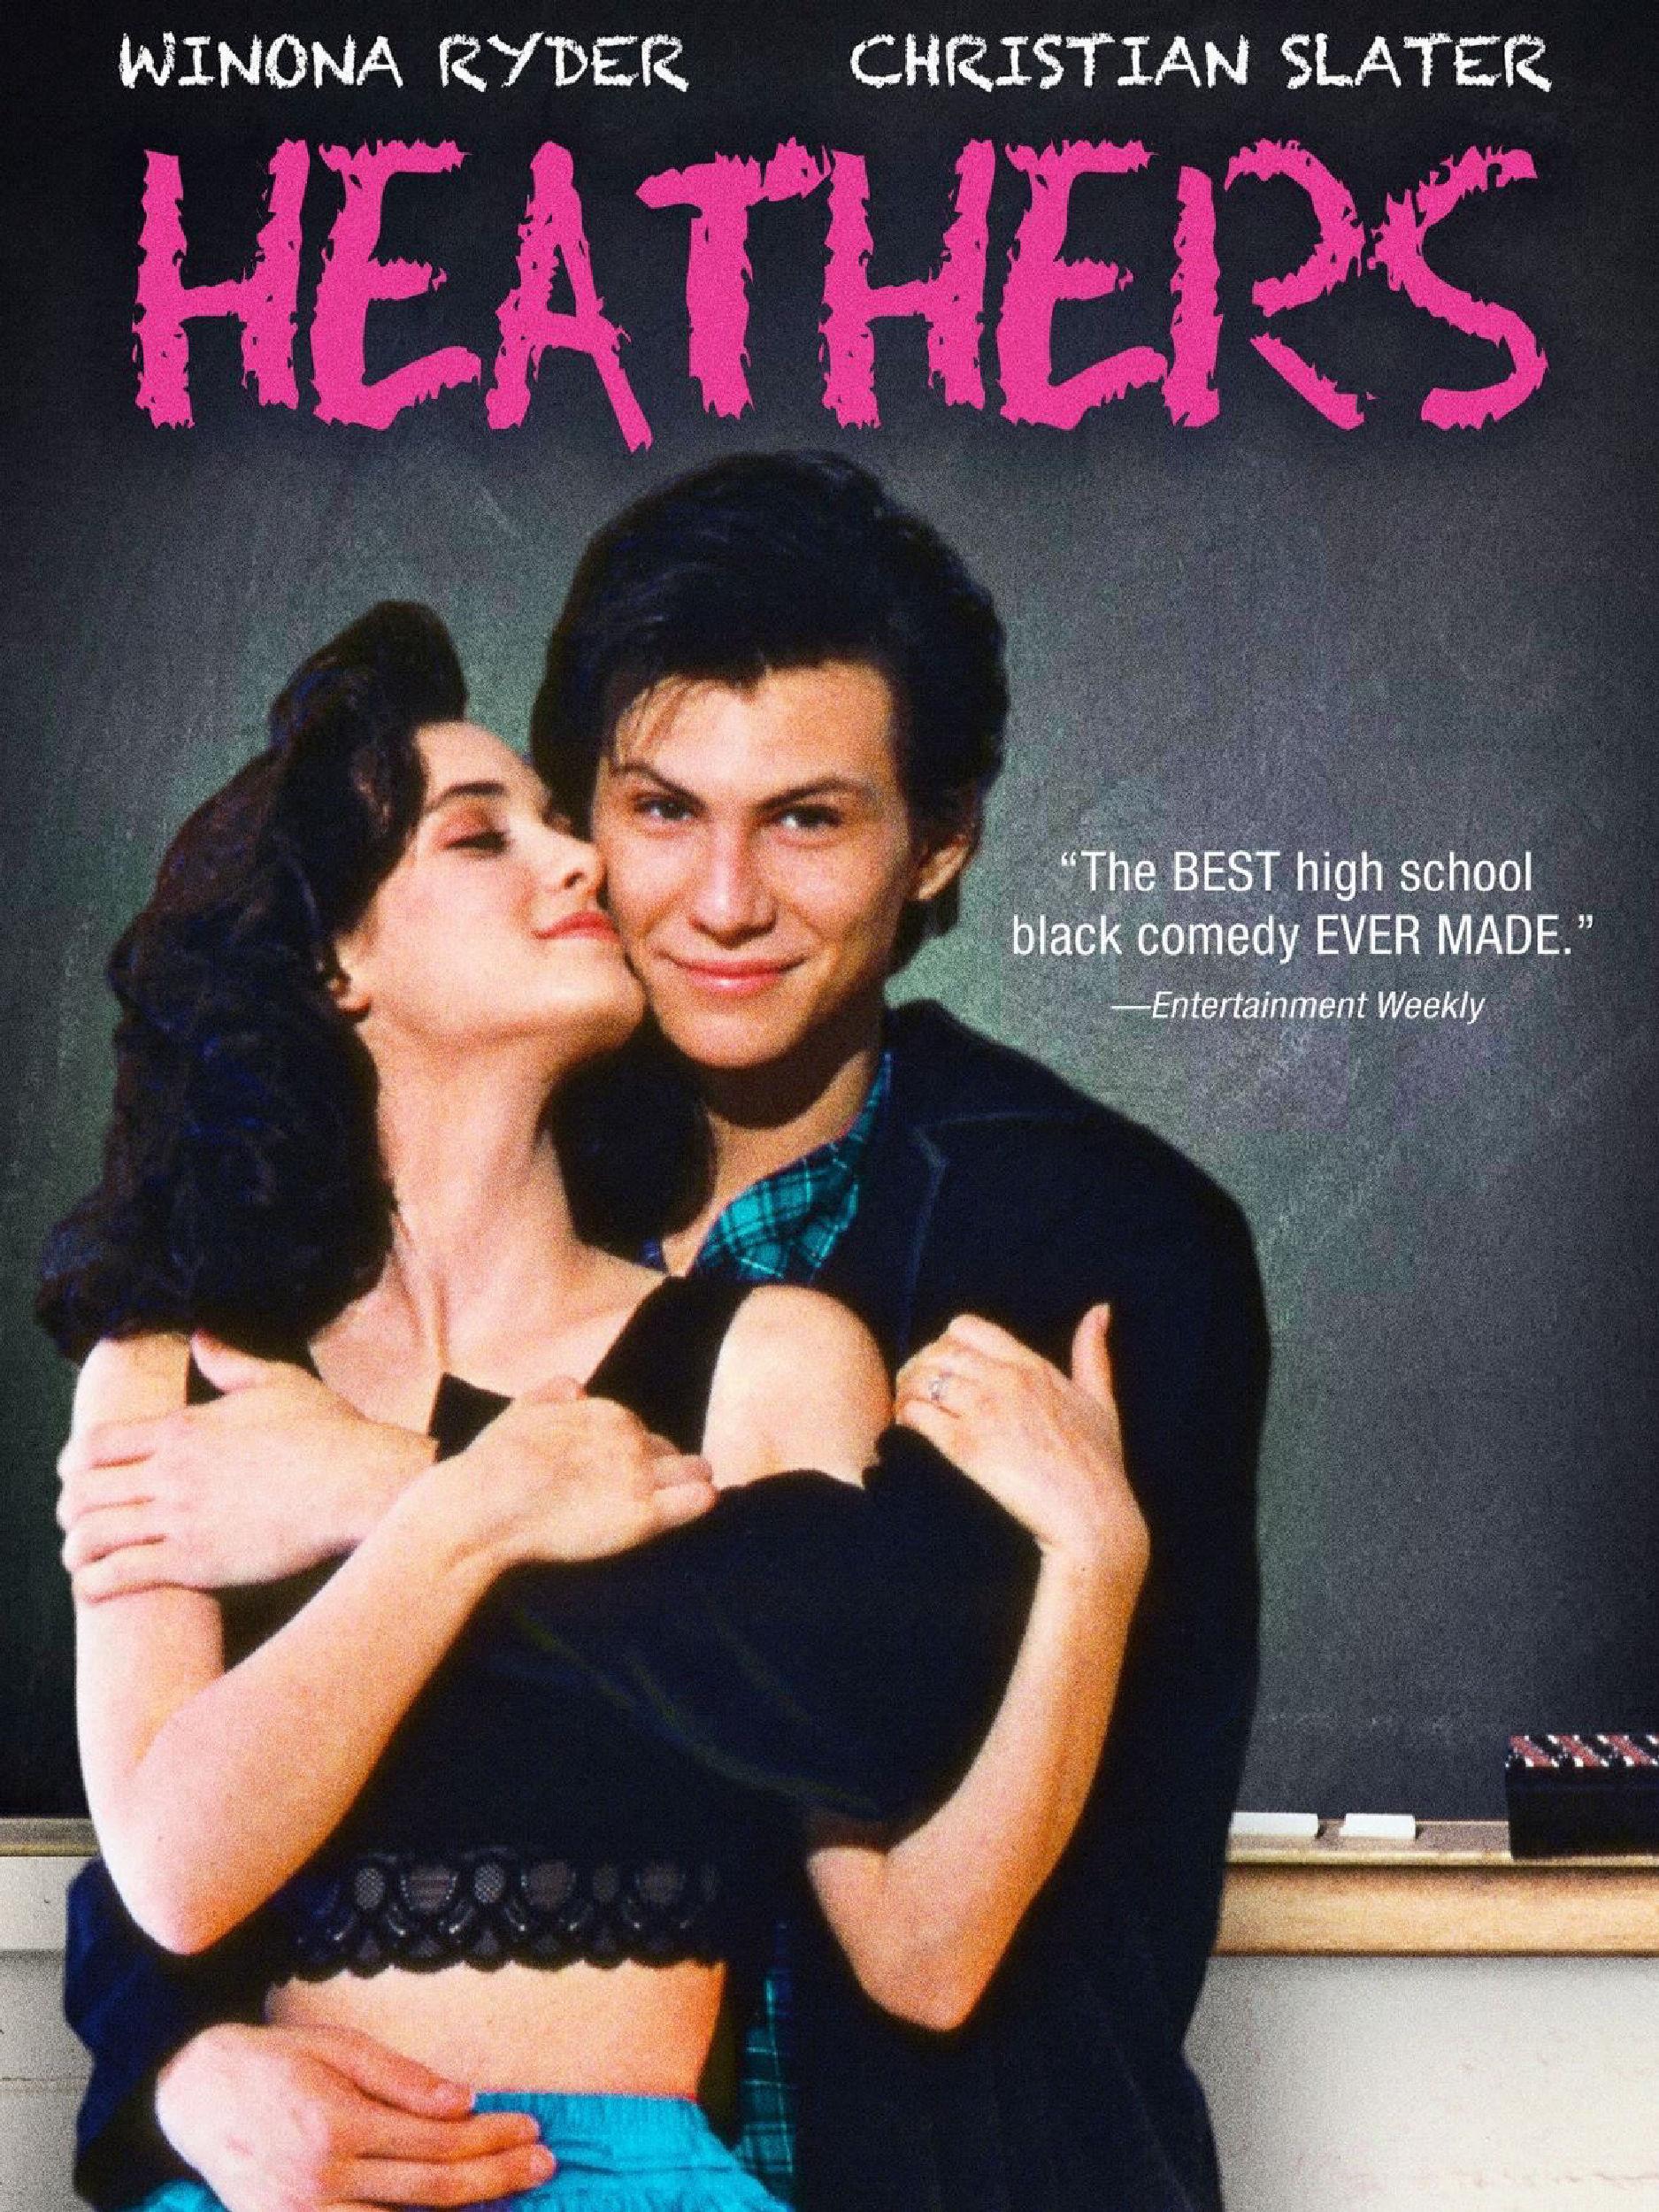 Heathers poster art